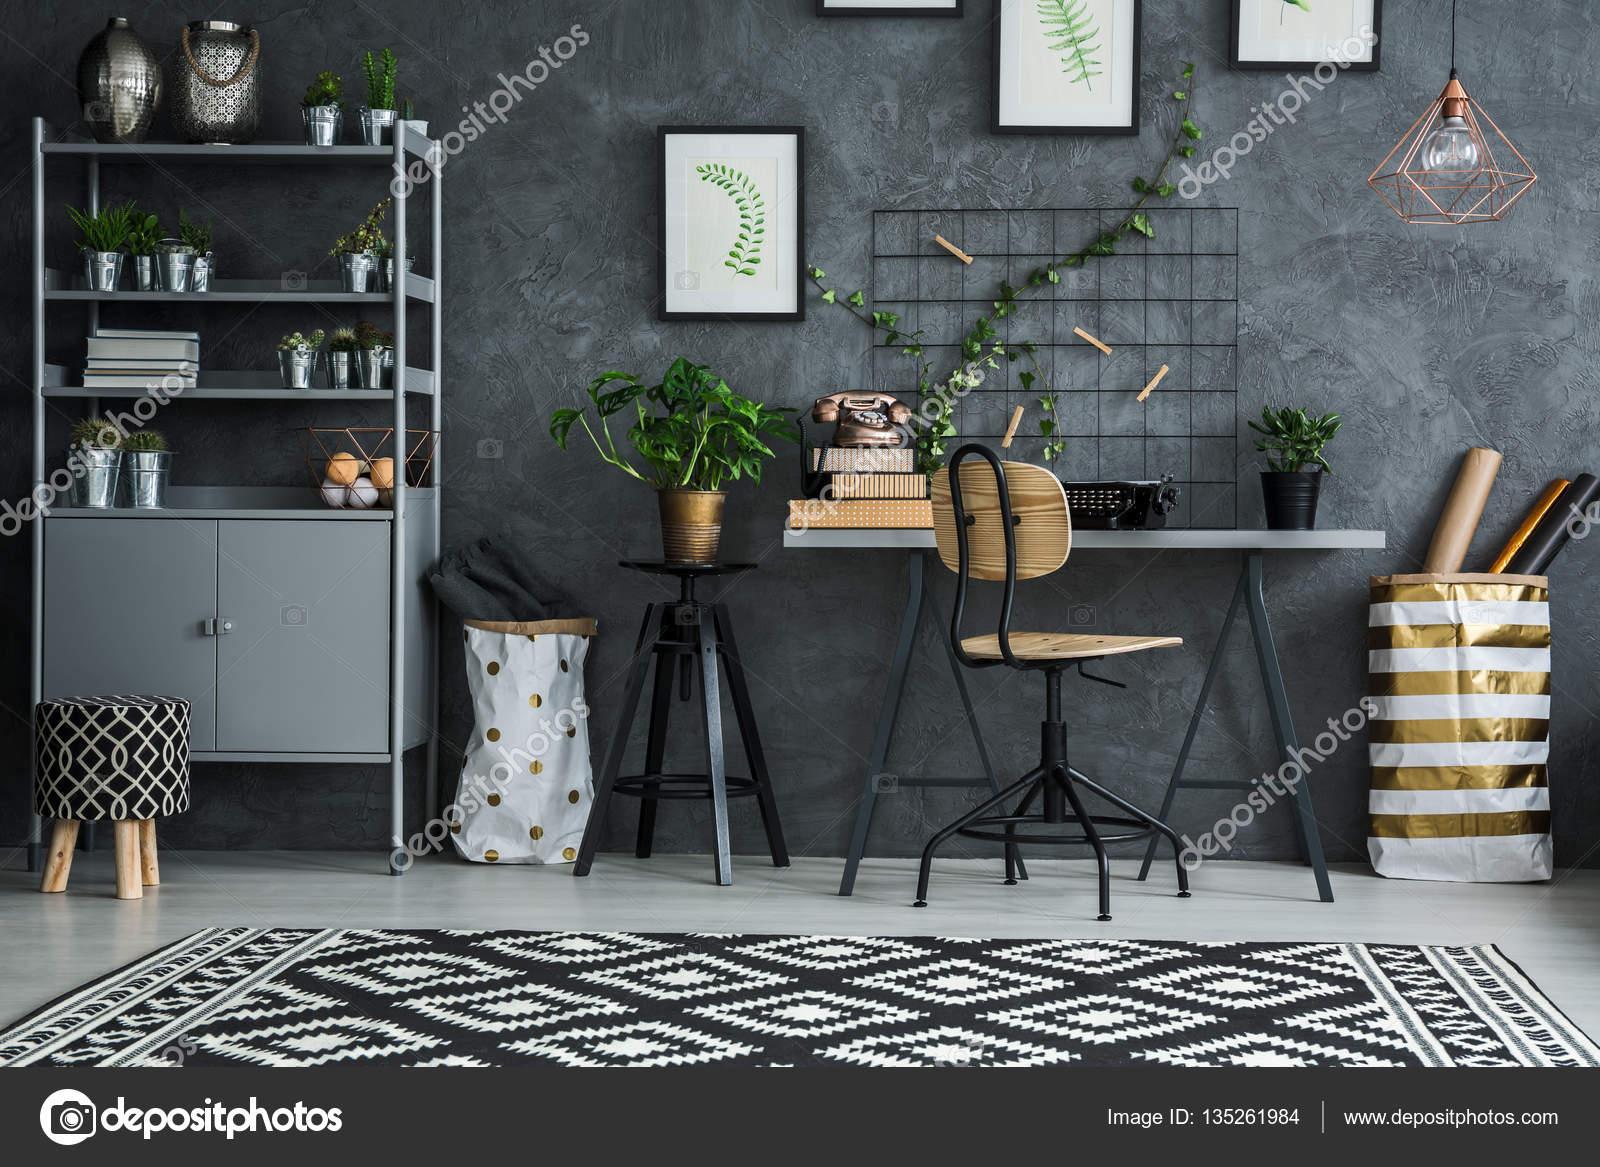 Kamer hoek bureau en stoel u2014 stockfoto © photographee.eu #135261984